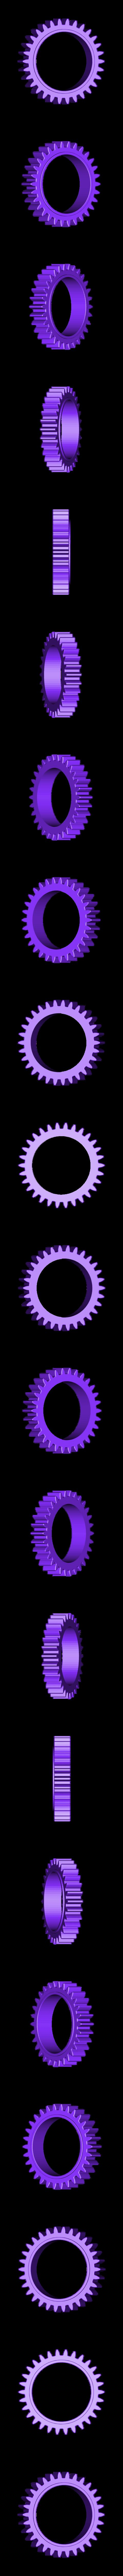 Gears clipart parameter. Free stl files main